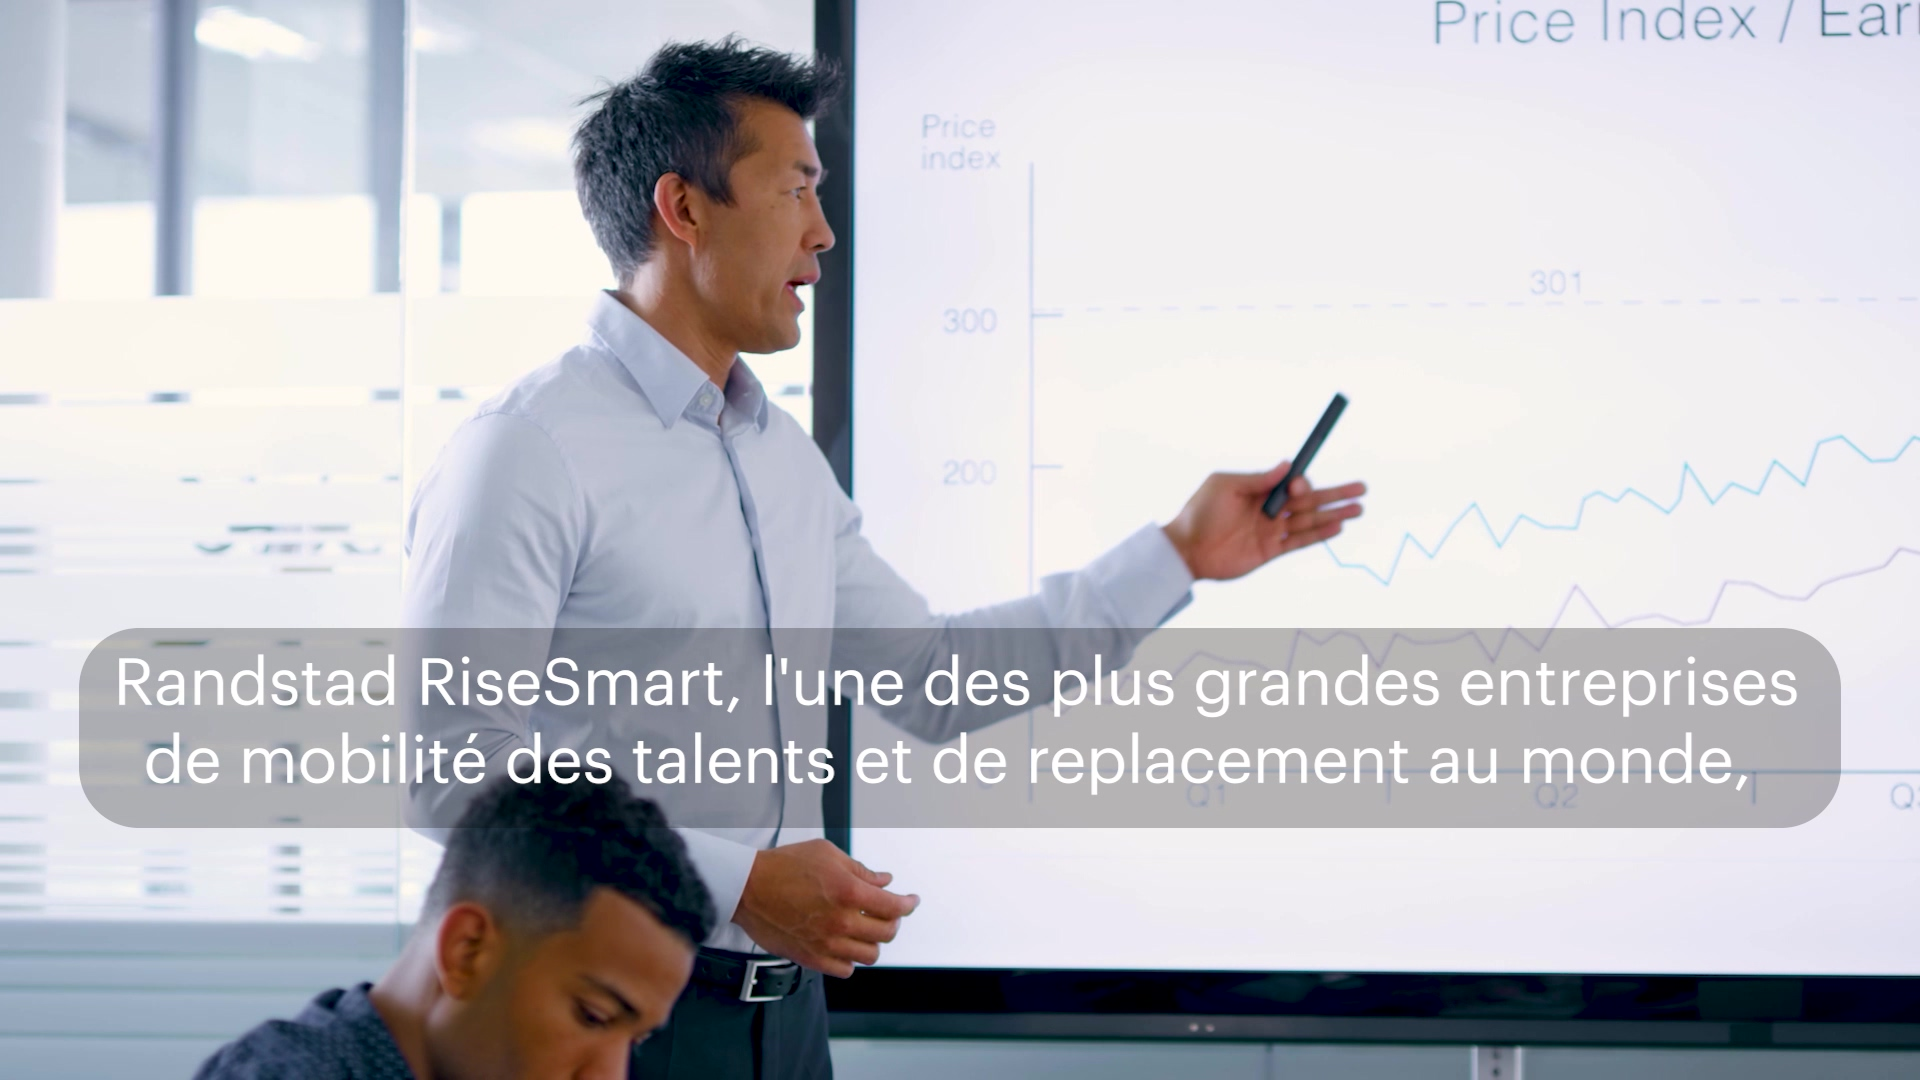 RiseSmart_Corporate_Global_Canadian French_FINAL